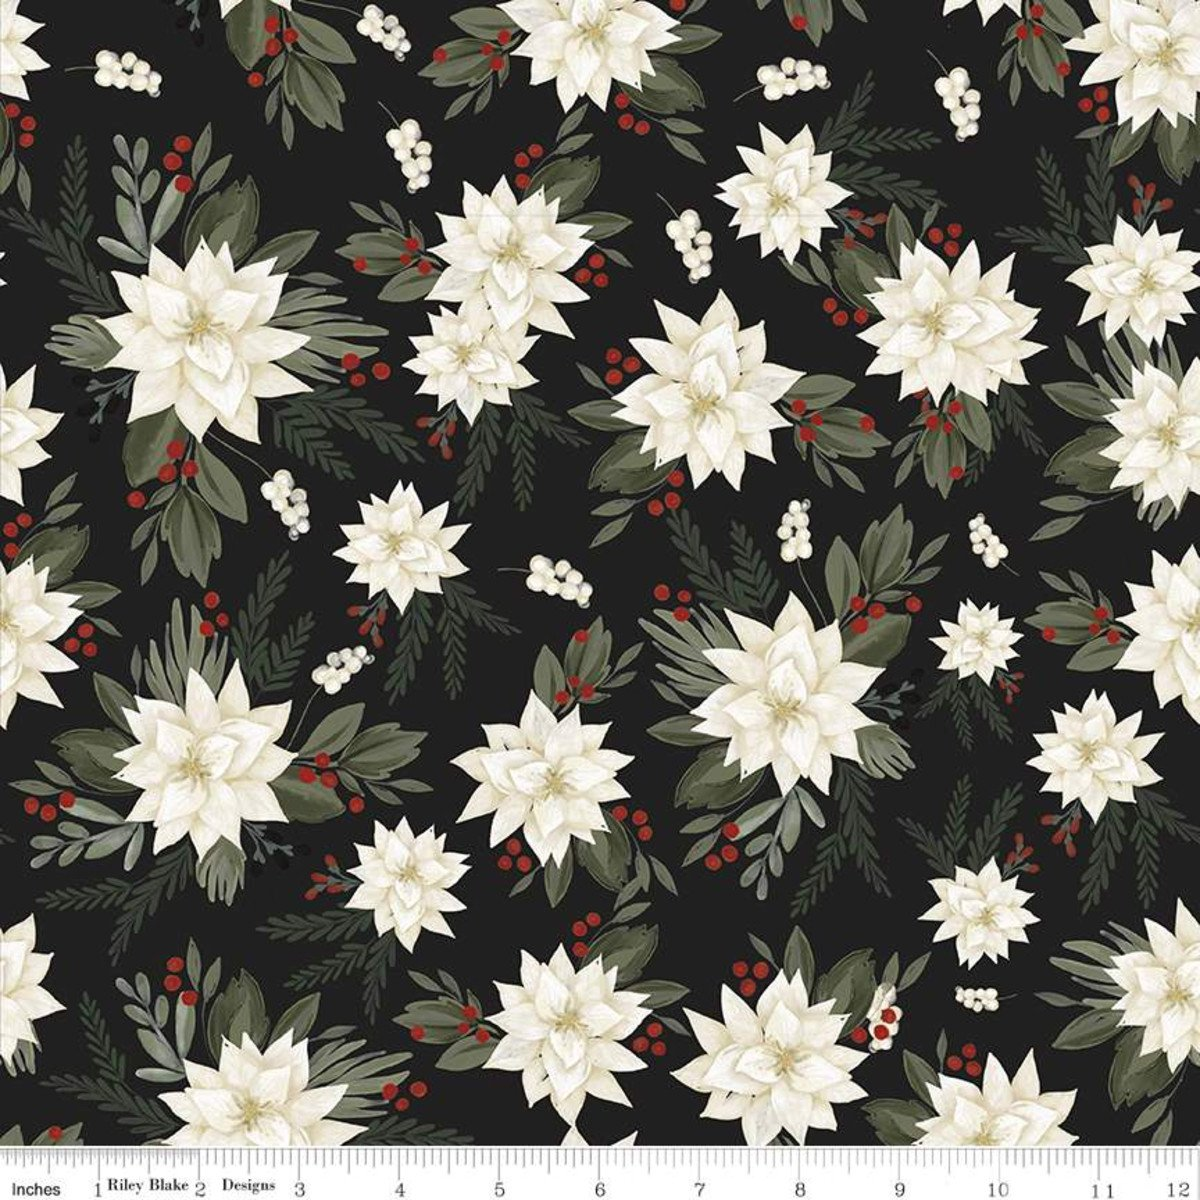 Farmhouse Christmas Poinsettias C10950 Black